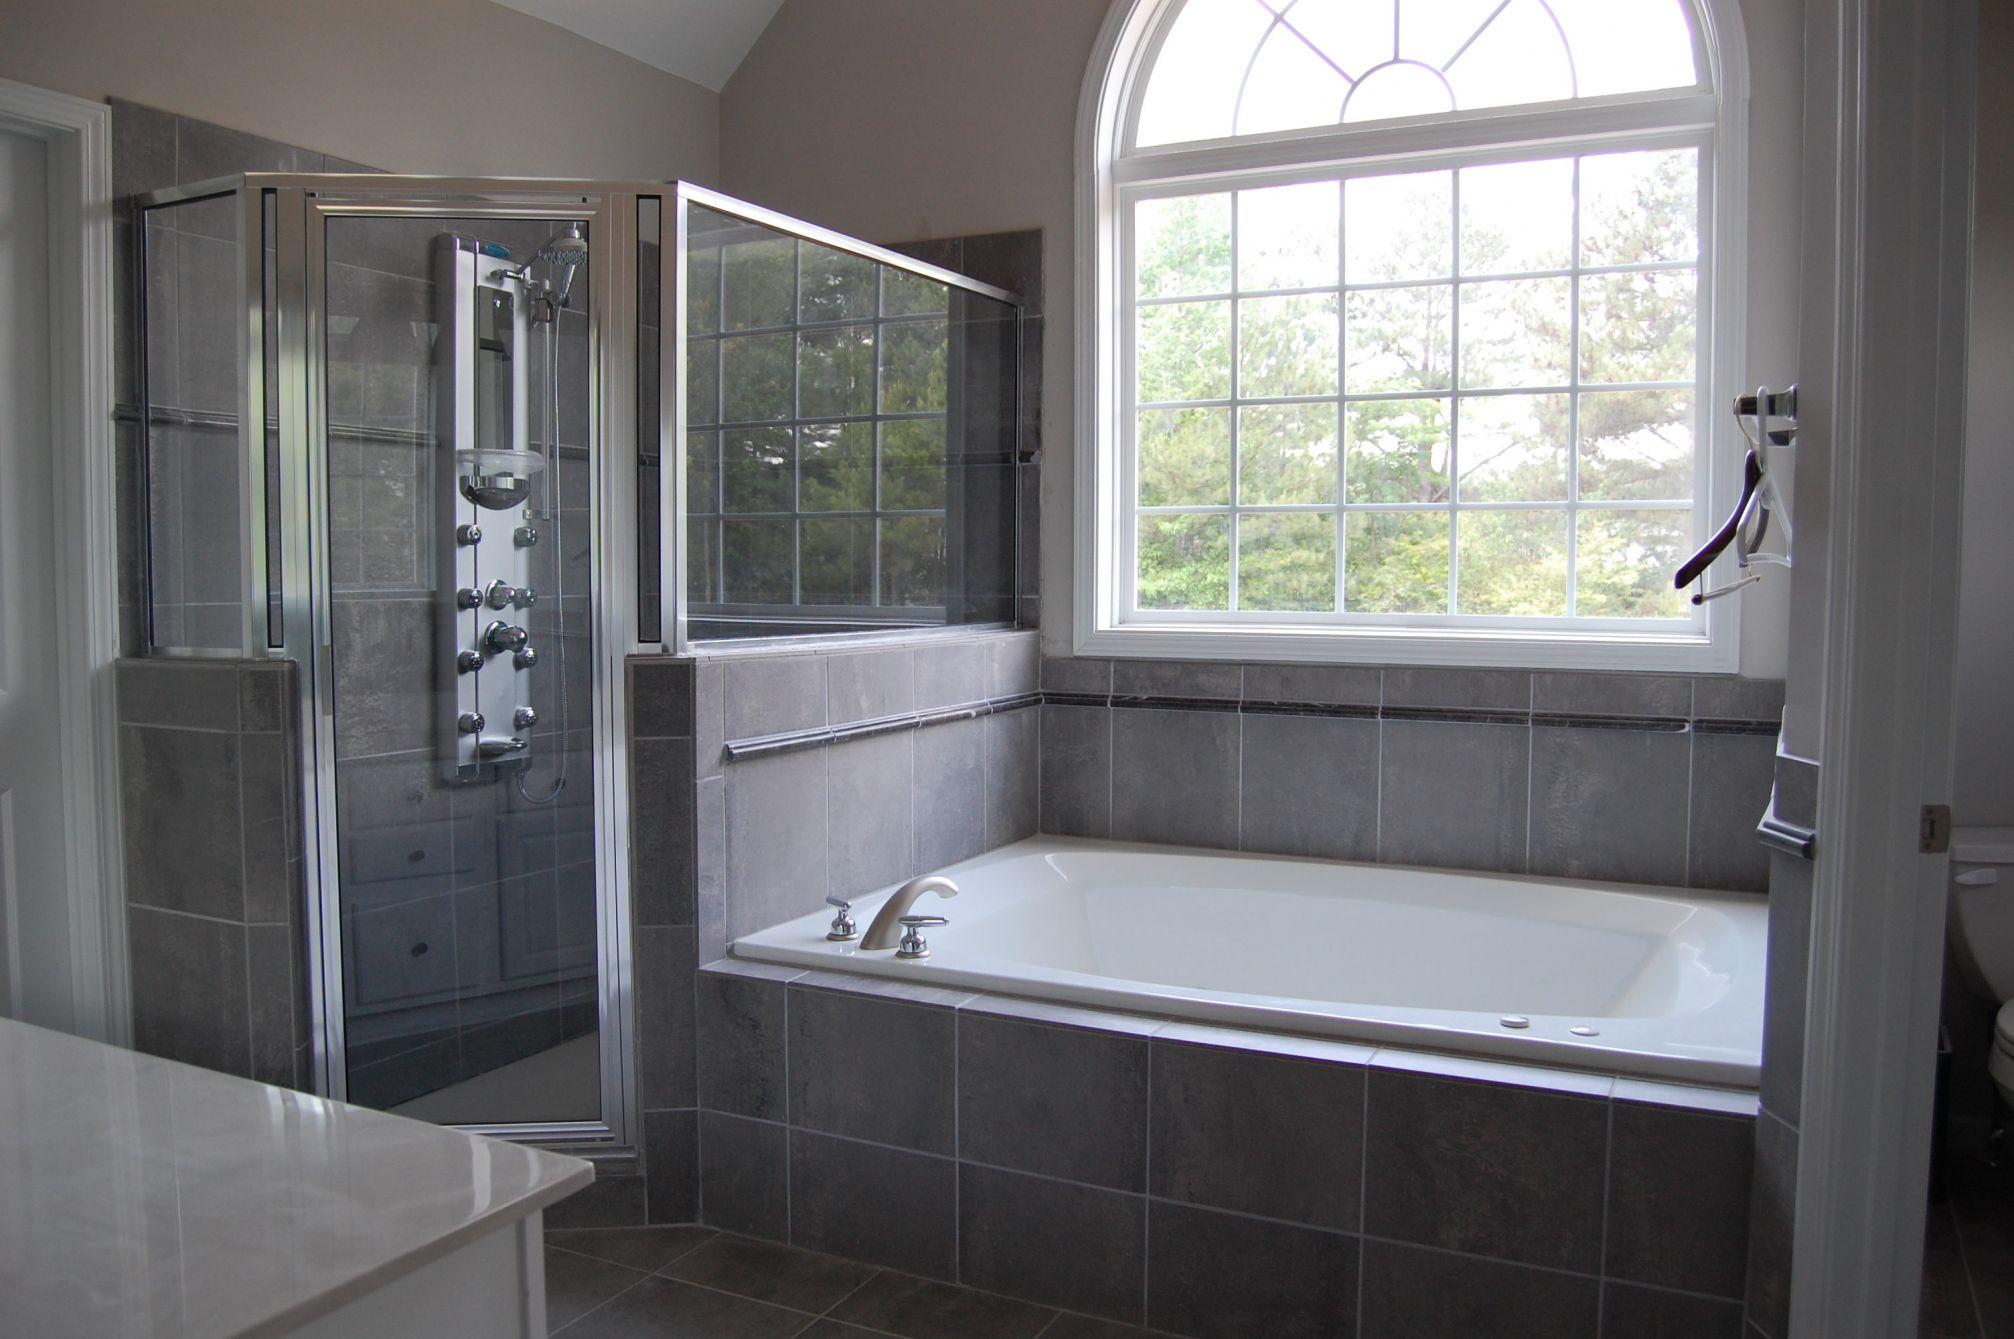 100 Small Bathroom Windows Home Depot Interior Paint Colors 2017